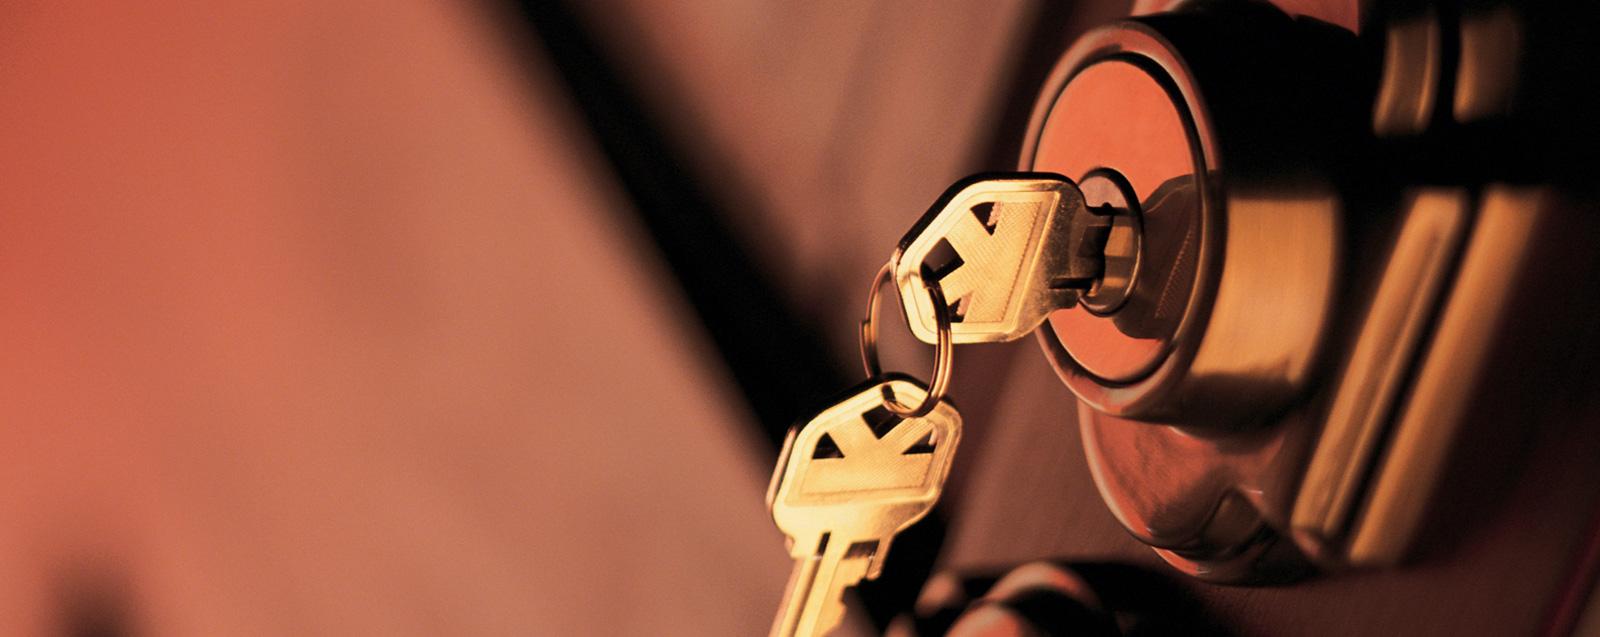 locksmith joondalup